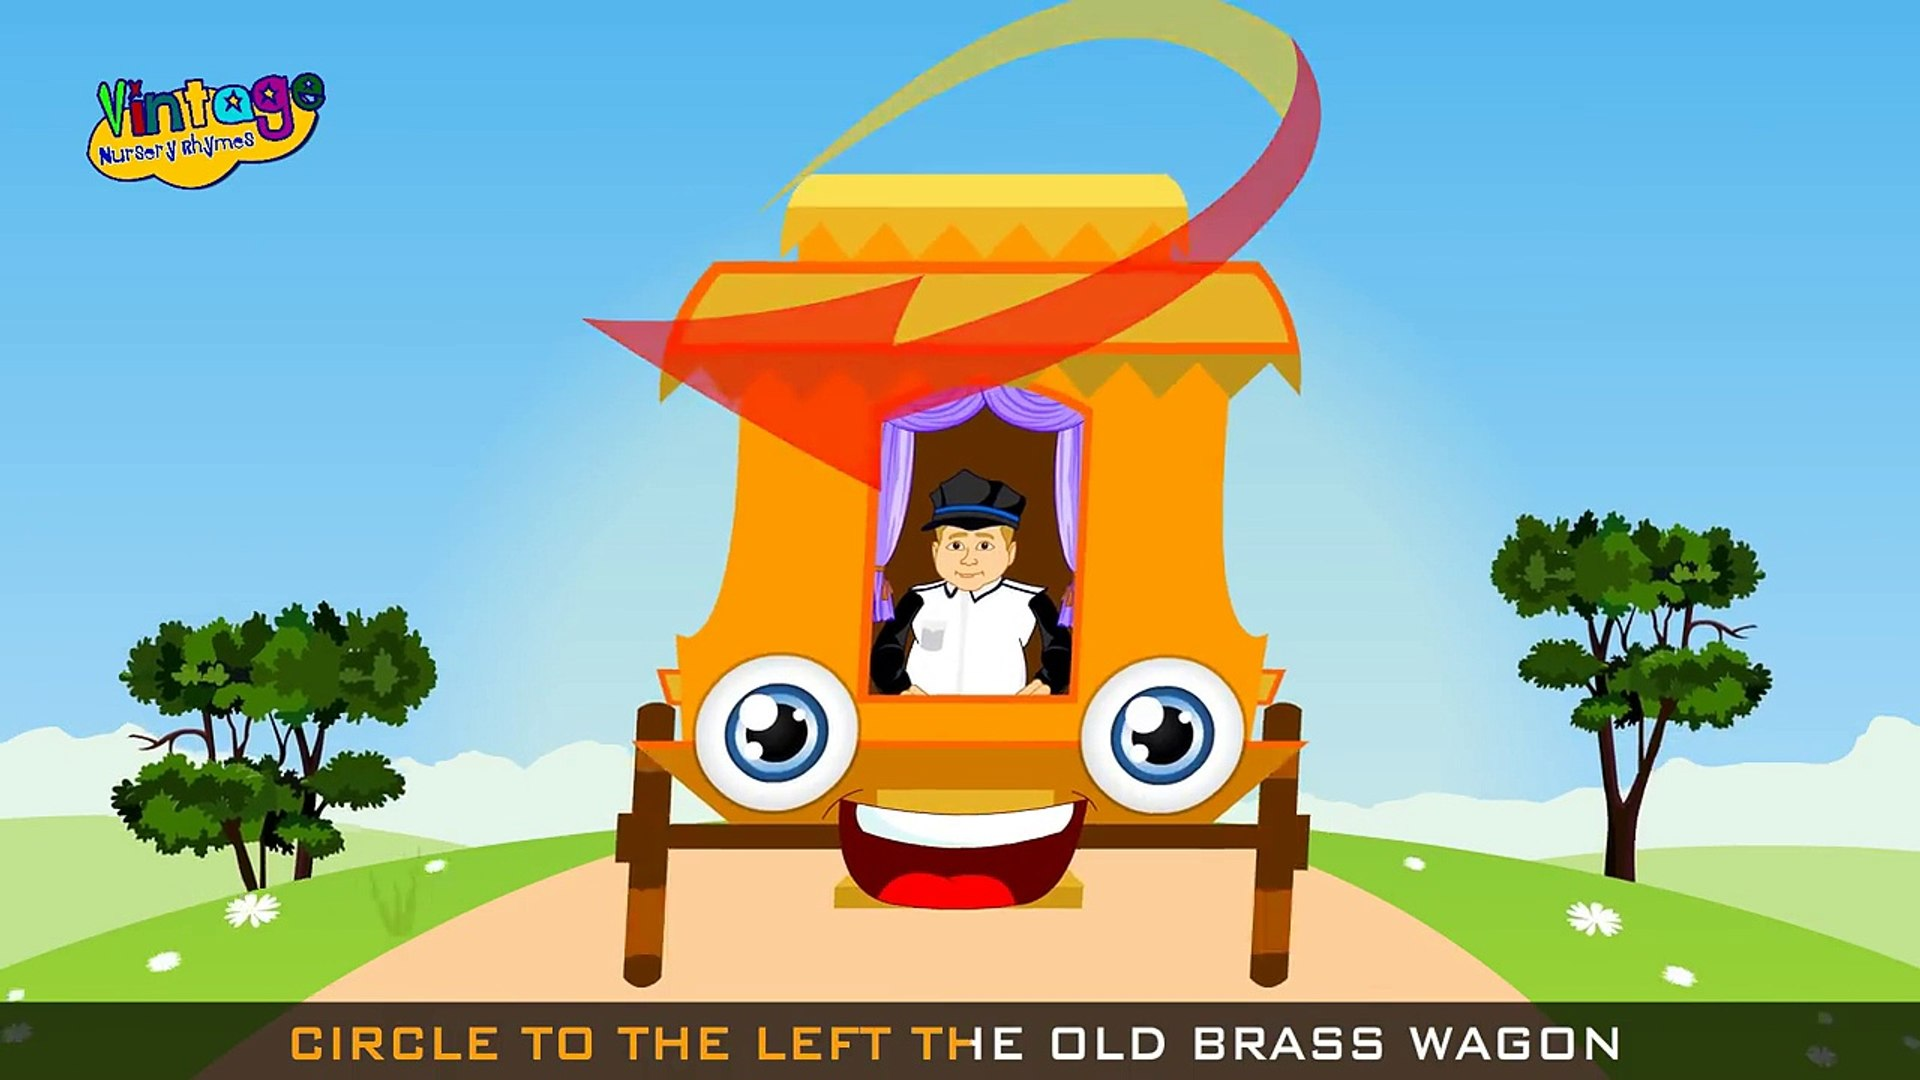 Old Brass Wagon Song | Childrens Nursery Rhyme With Lyrics | English Nursery Rhymes